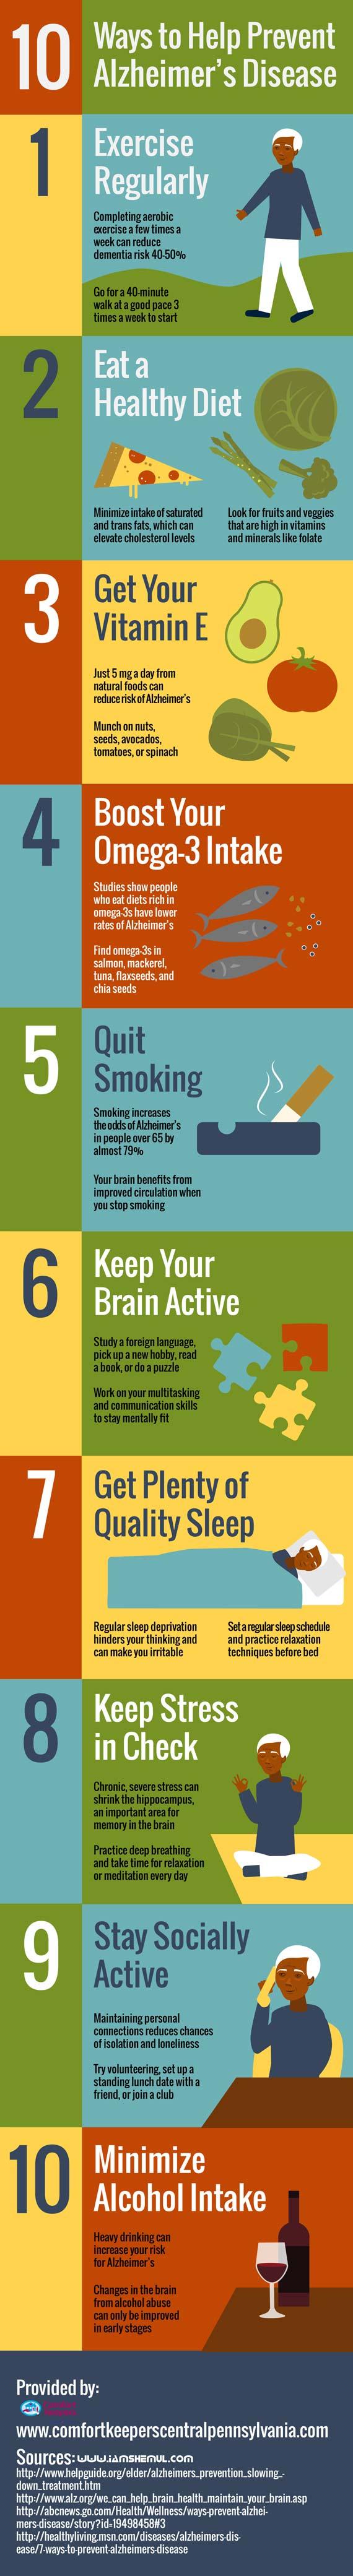 How To Prevent Alzheimer's Disease 10 Best Ways